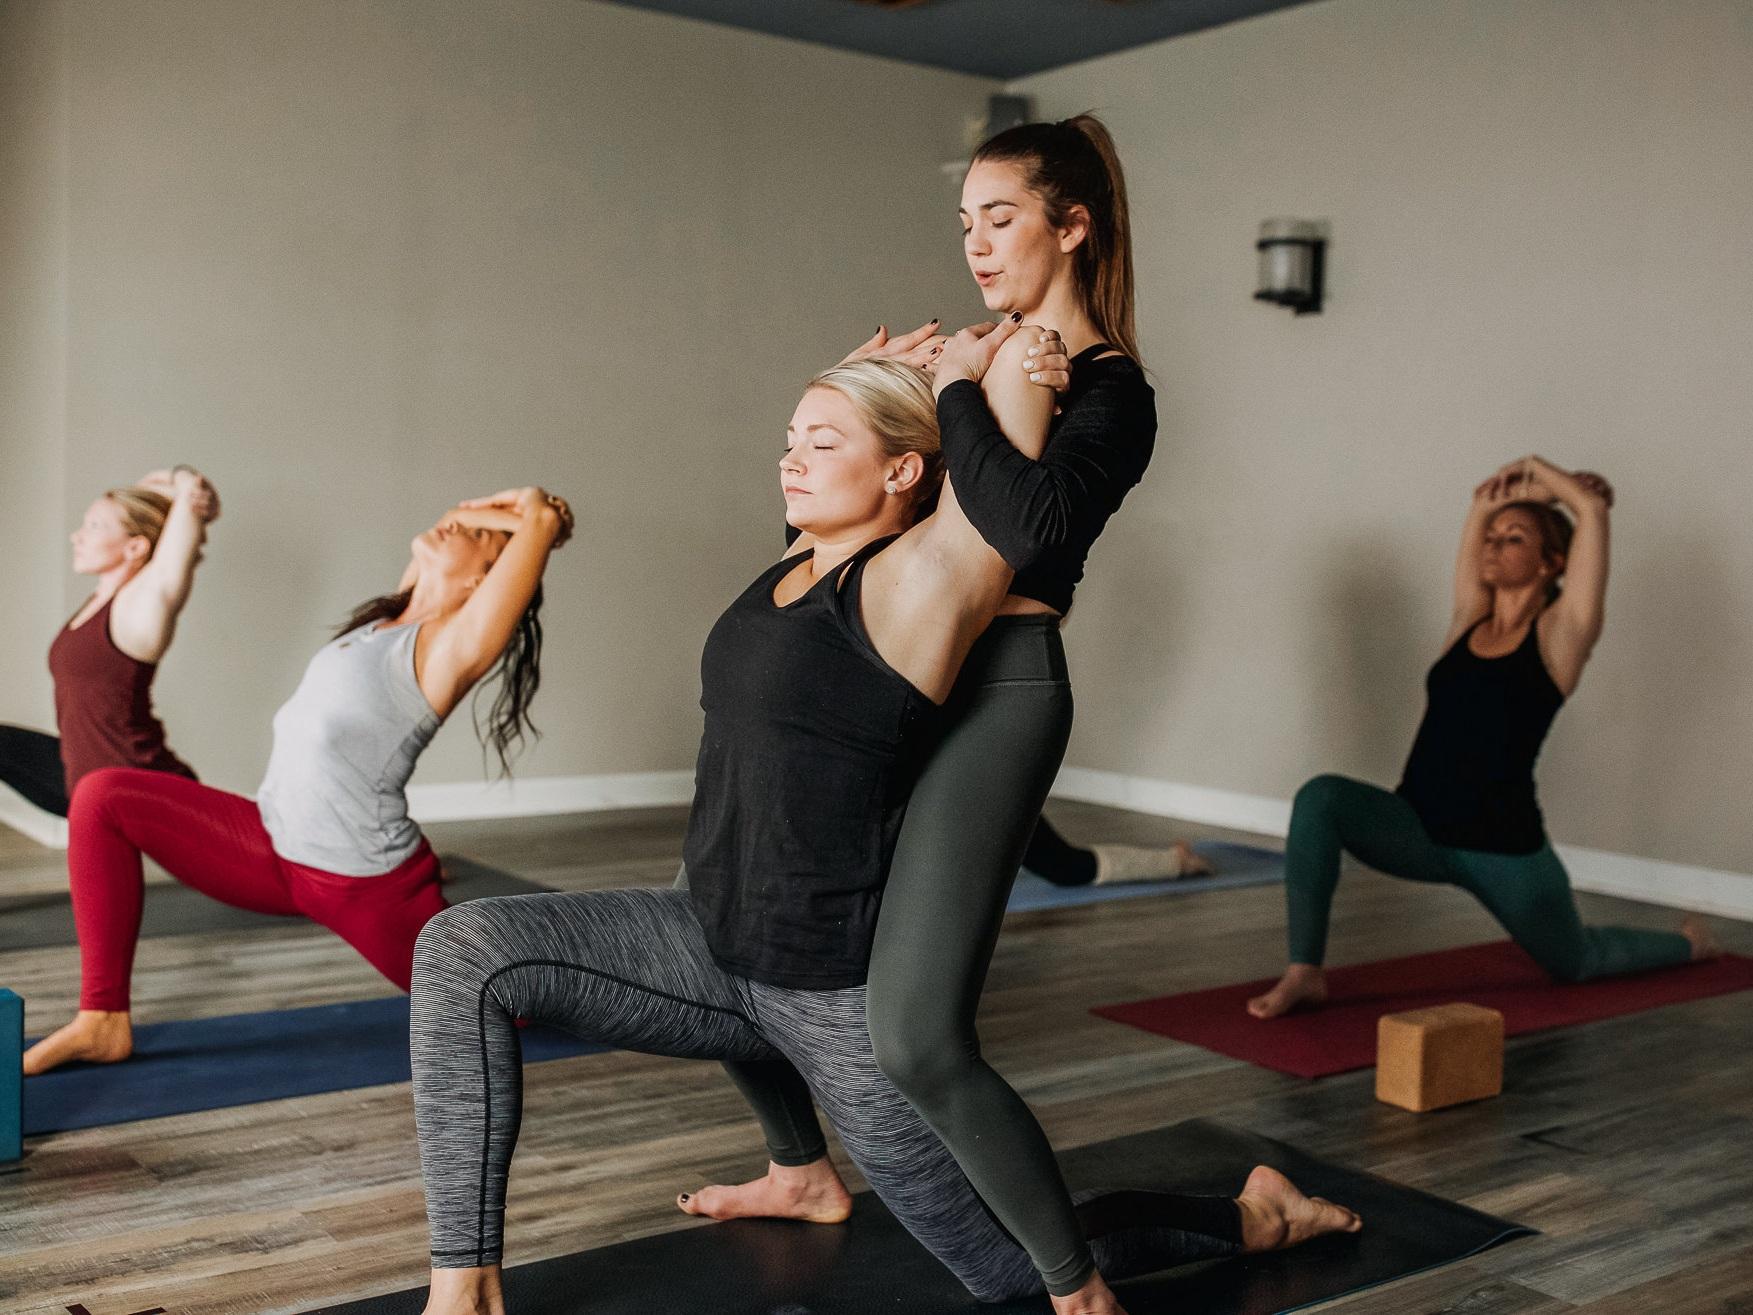 Yoga+Strong+Class-Yoga+Strong+Class+edited-0030.jpg